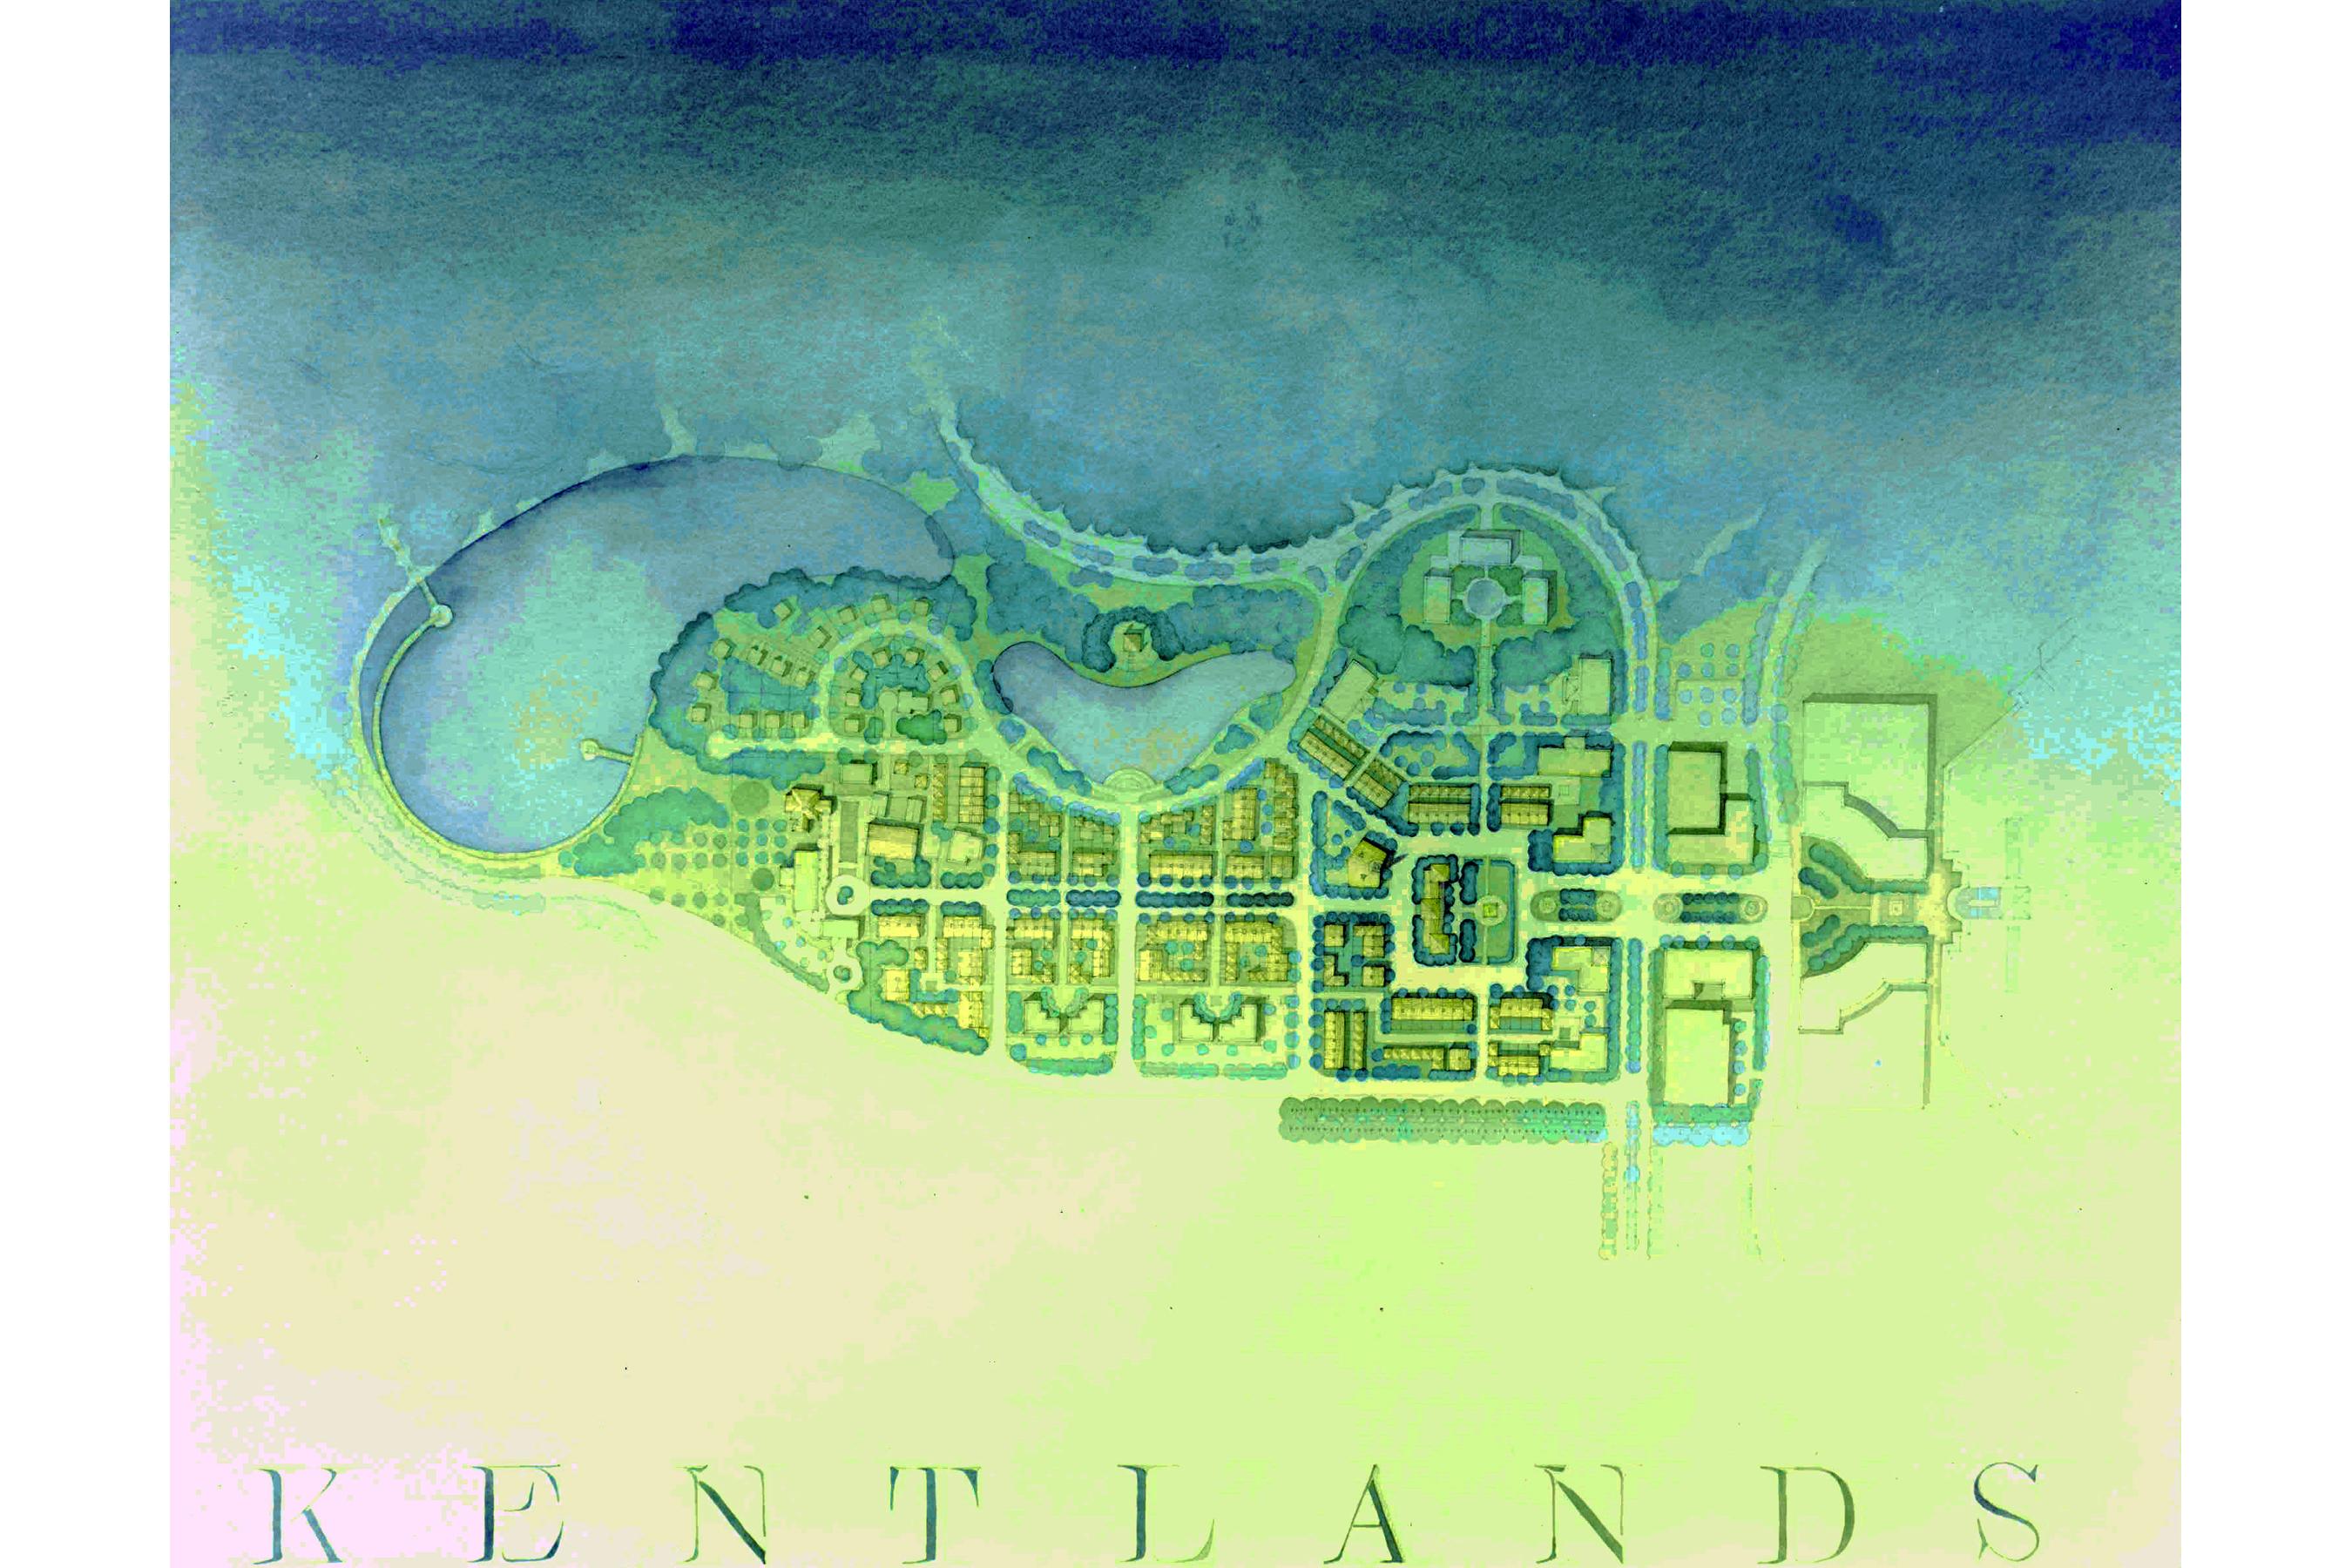 Kentland-2015a.jpg